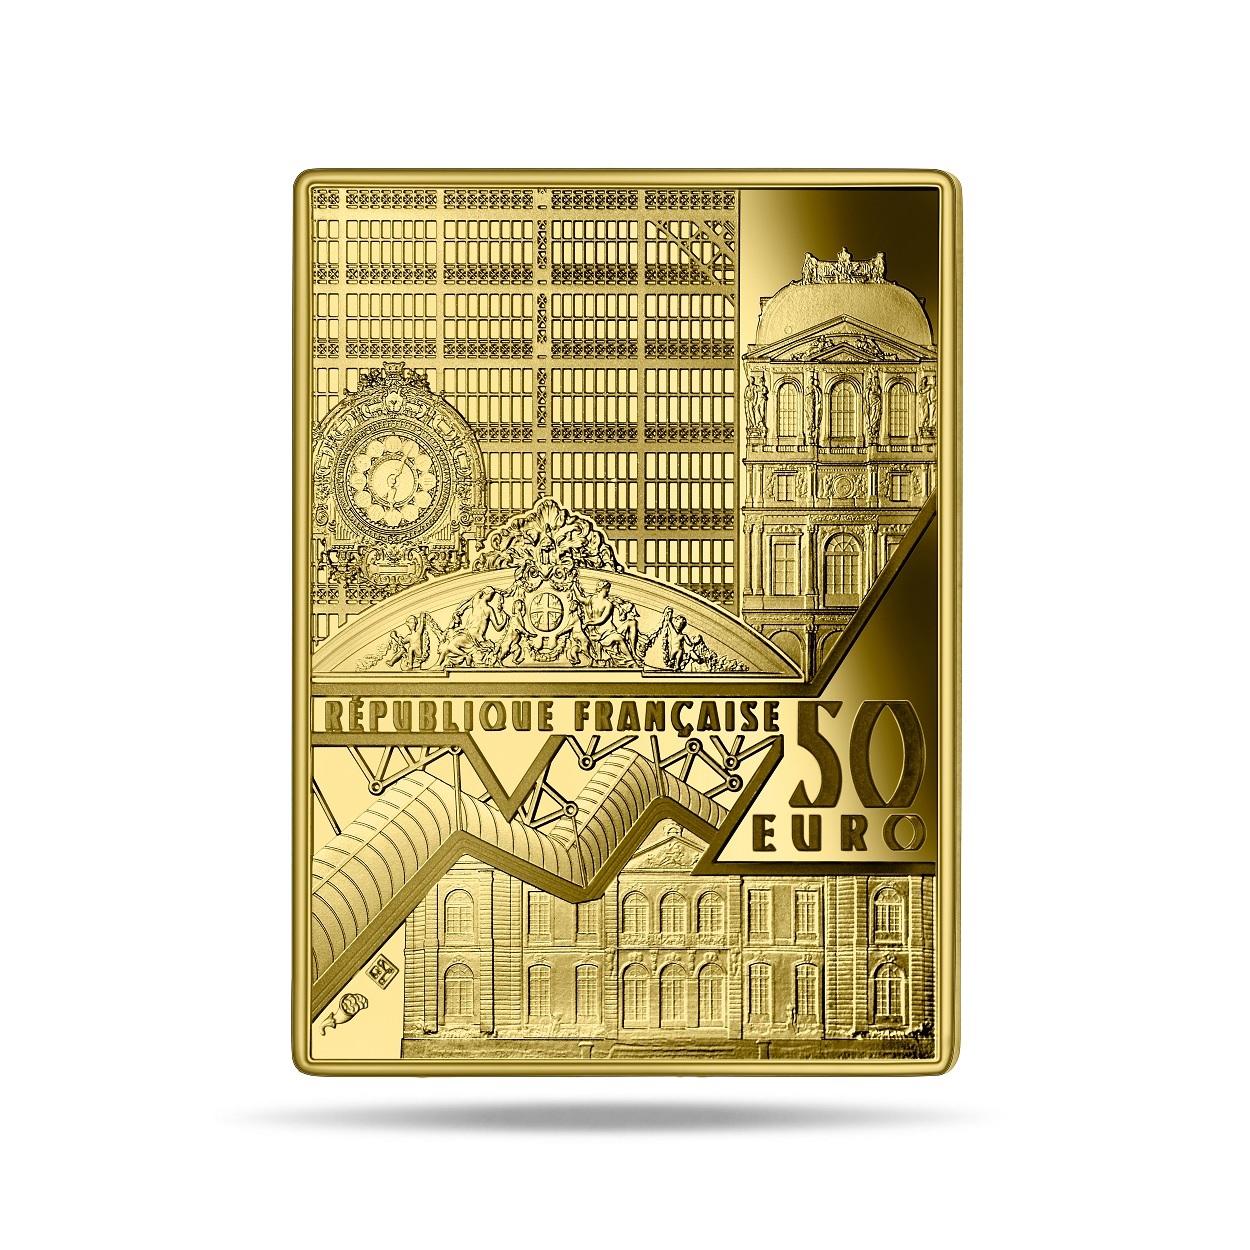 (EUR07.Proof.2021.10041356350000) 50 euro France 2021 Proof gold - Johannes Vermeer Obverse (zoom)